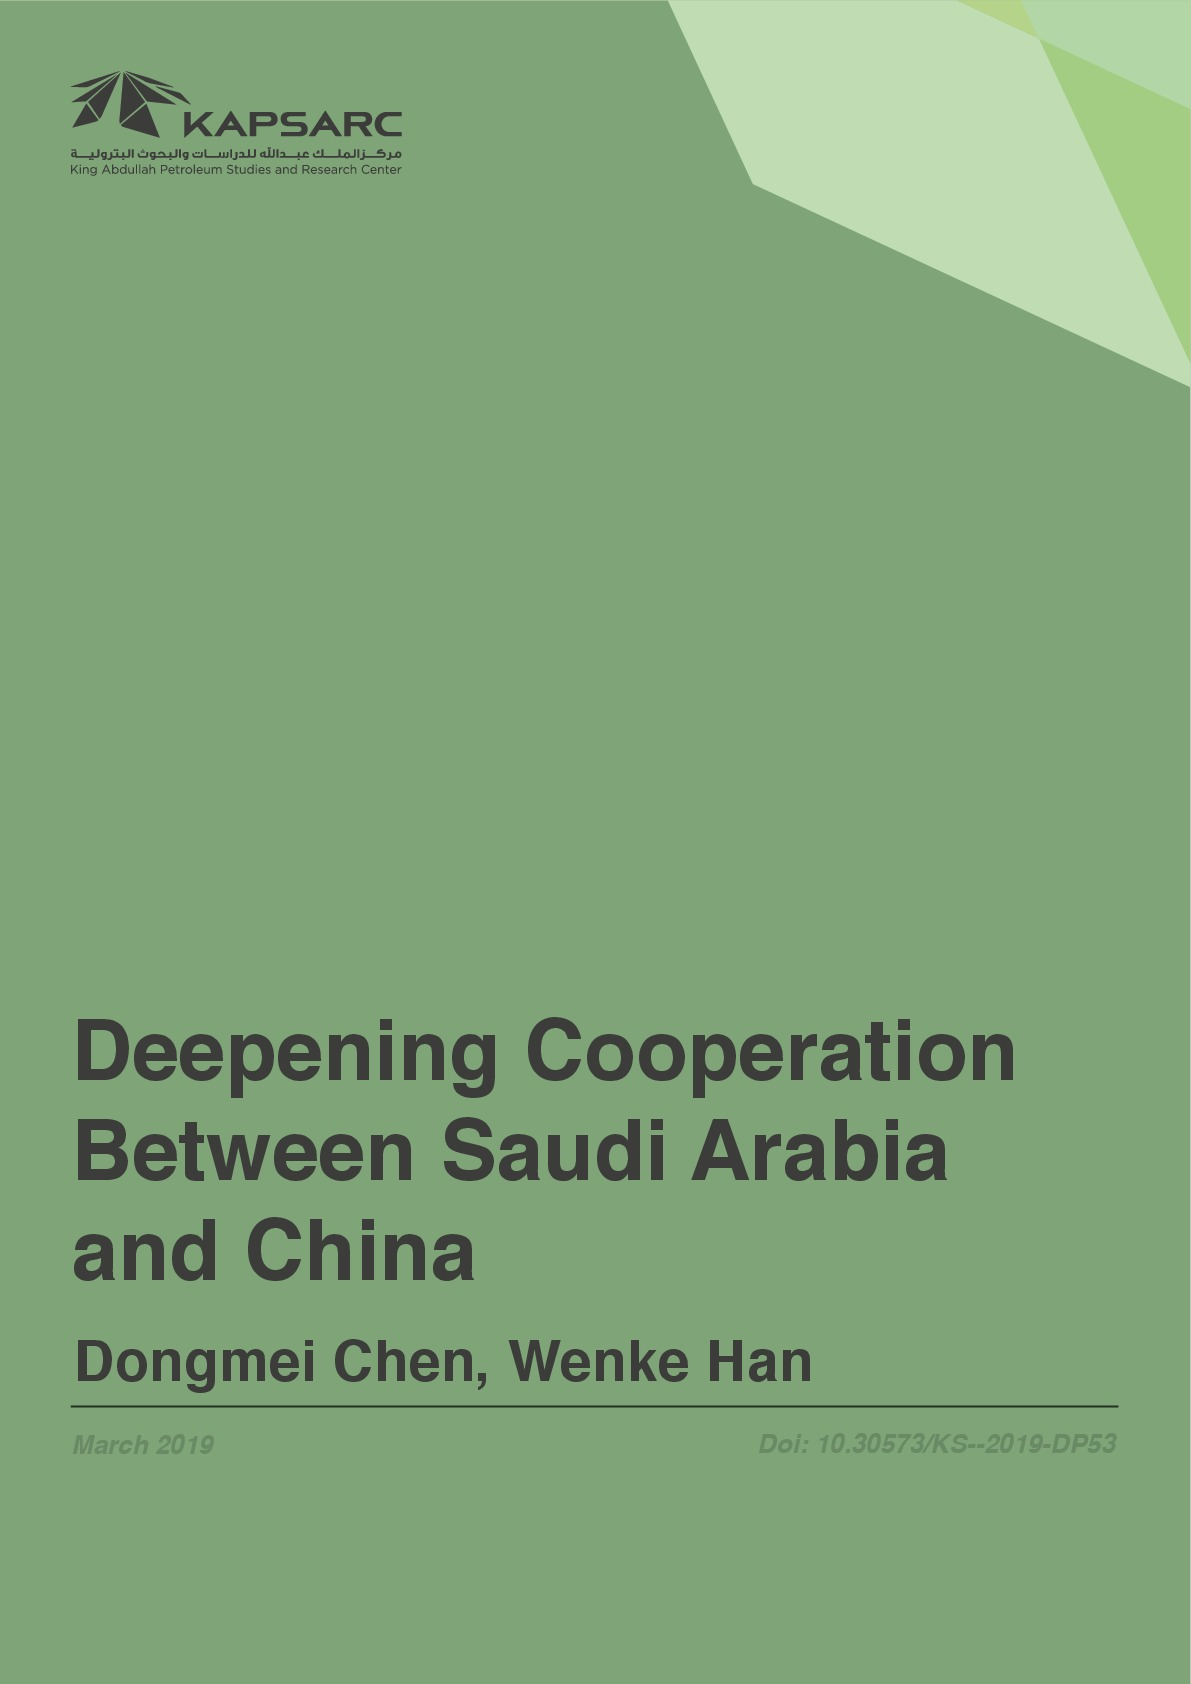 Deepening Cooperation Between Saudi Arabia and China